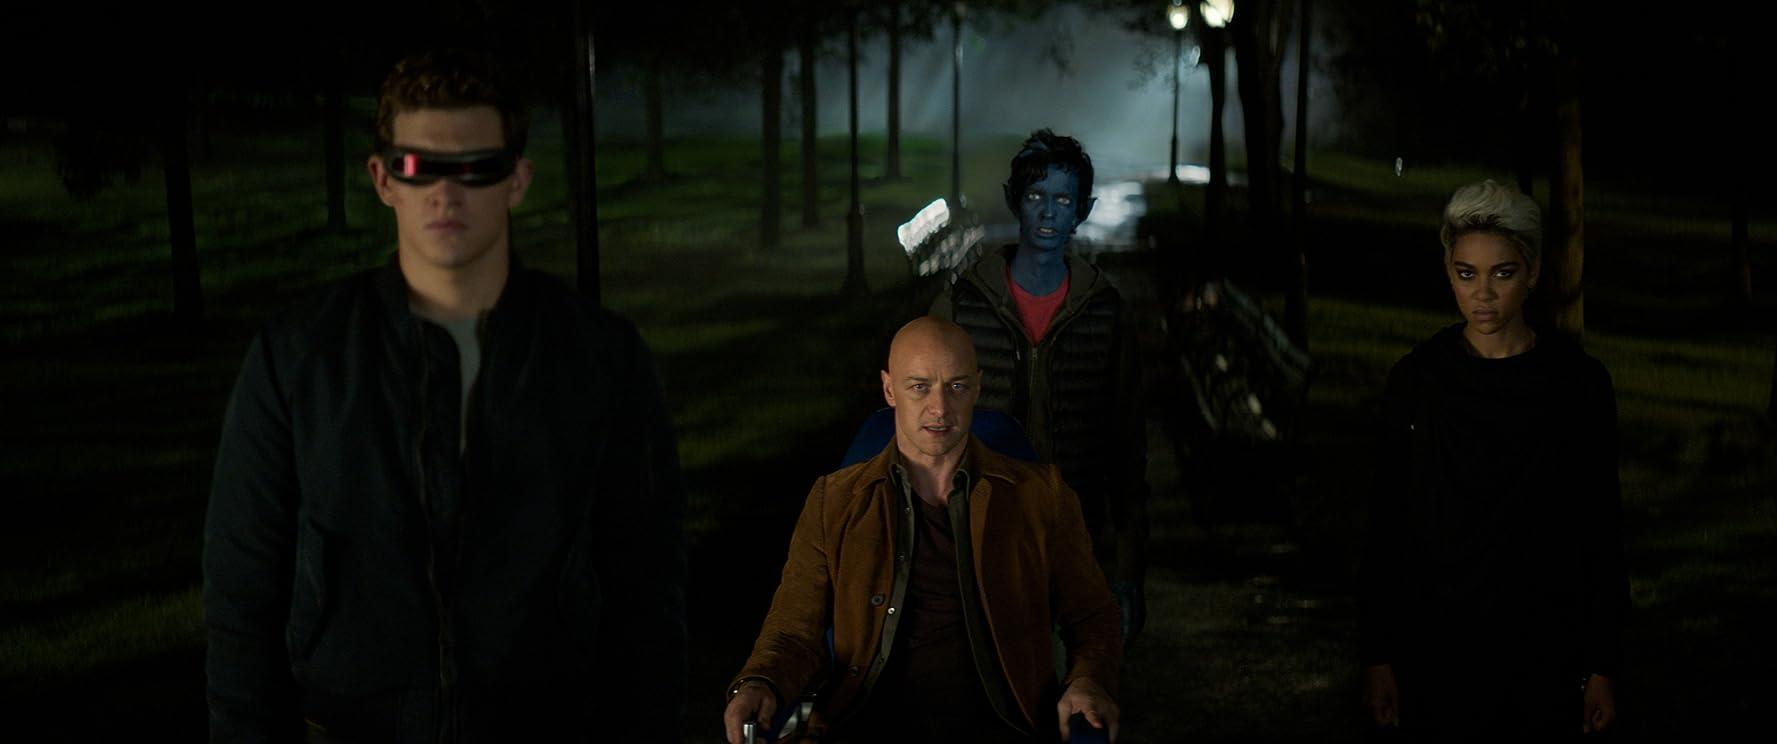 James McAvoy, Kodi Smit-McPhee, Alexandra Shipp, and Tye Sheridan in Dark Phoenix (2019)